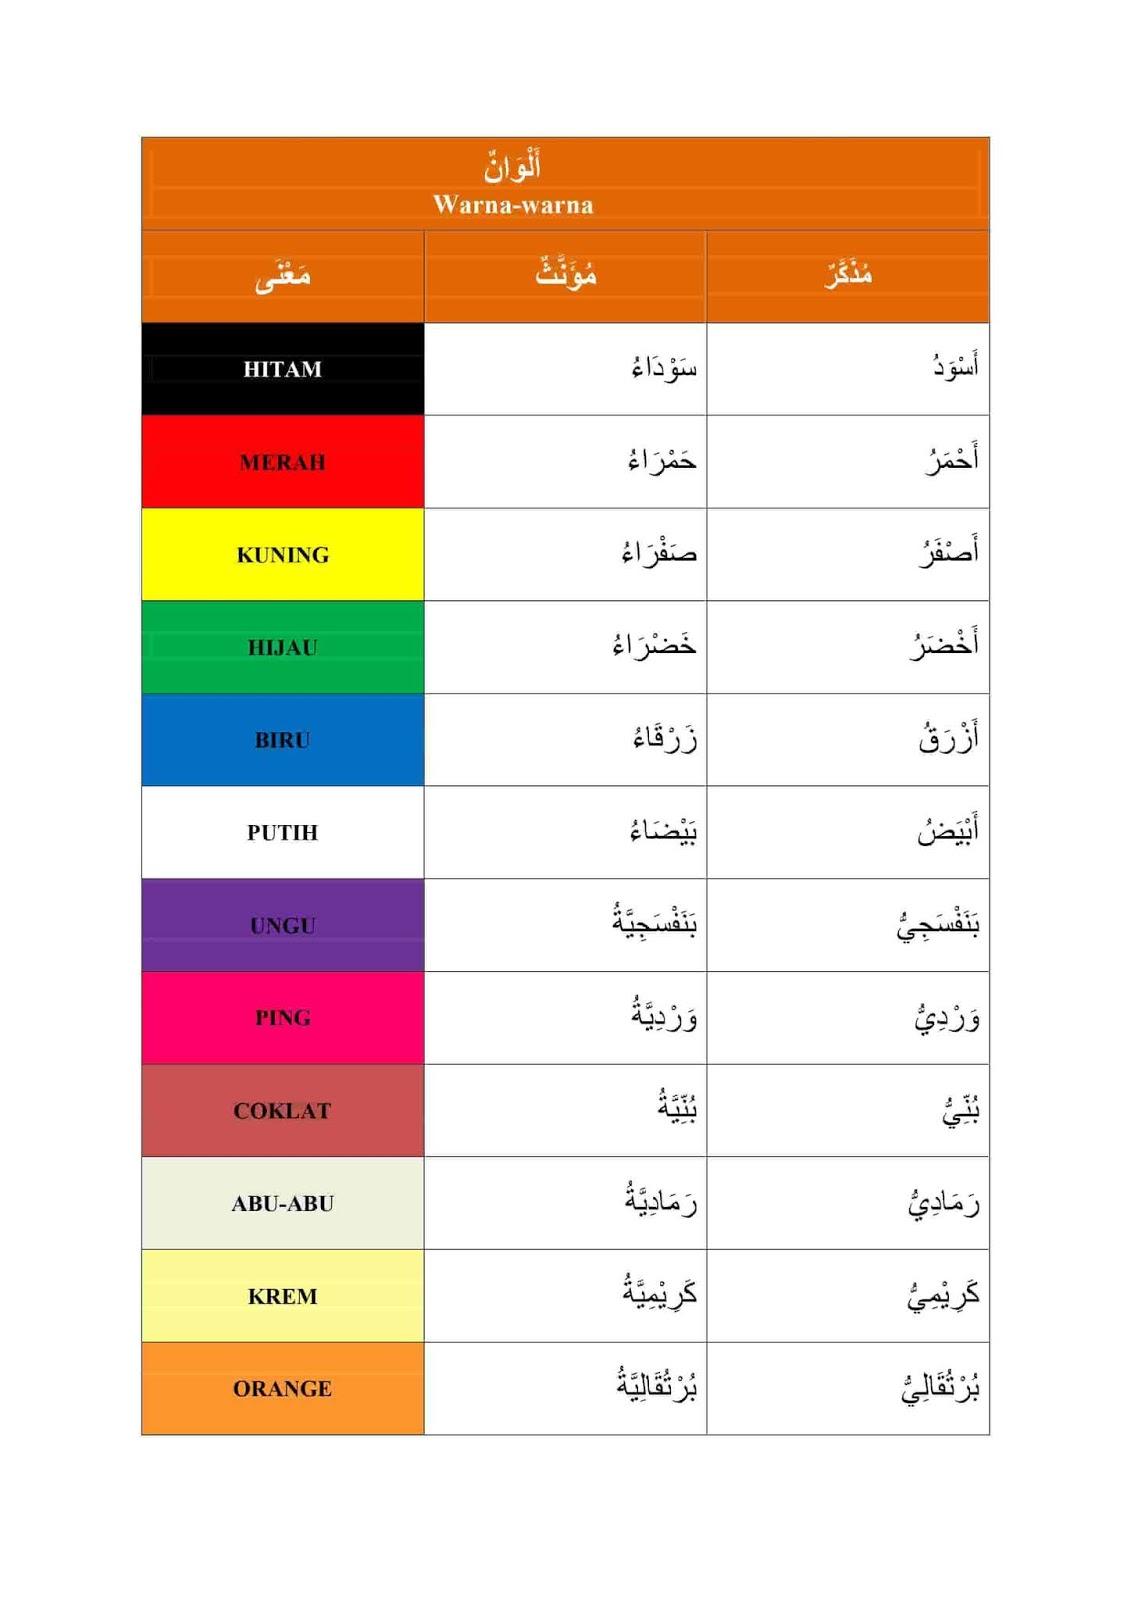 Nama Warna Dalam Bahasa Arab : warna, dalam, bahasa, Warna, Dalam, Bahasa, Arobiyah, Institute